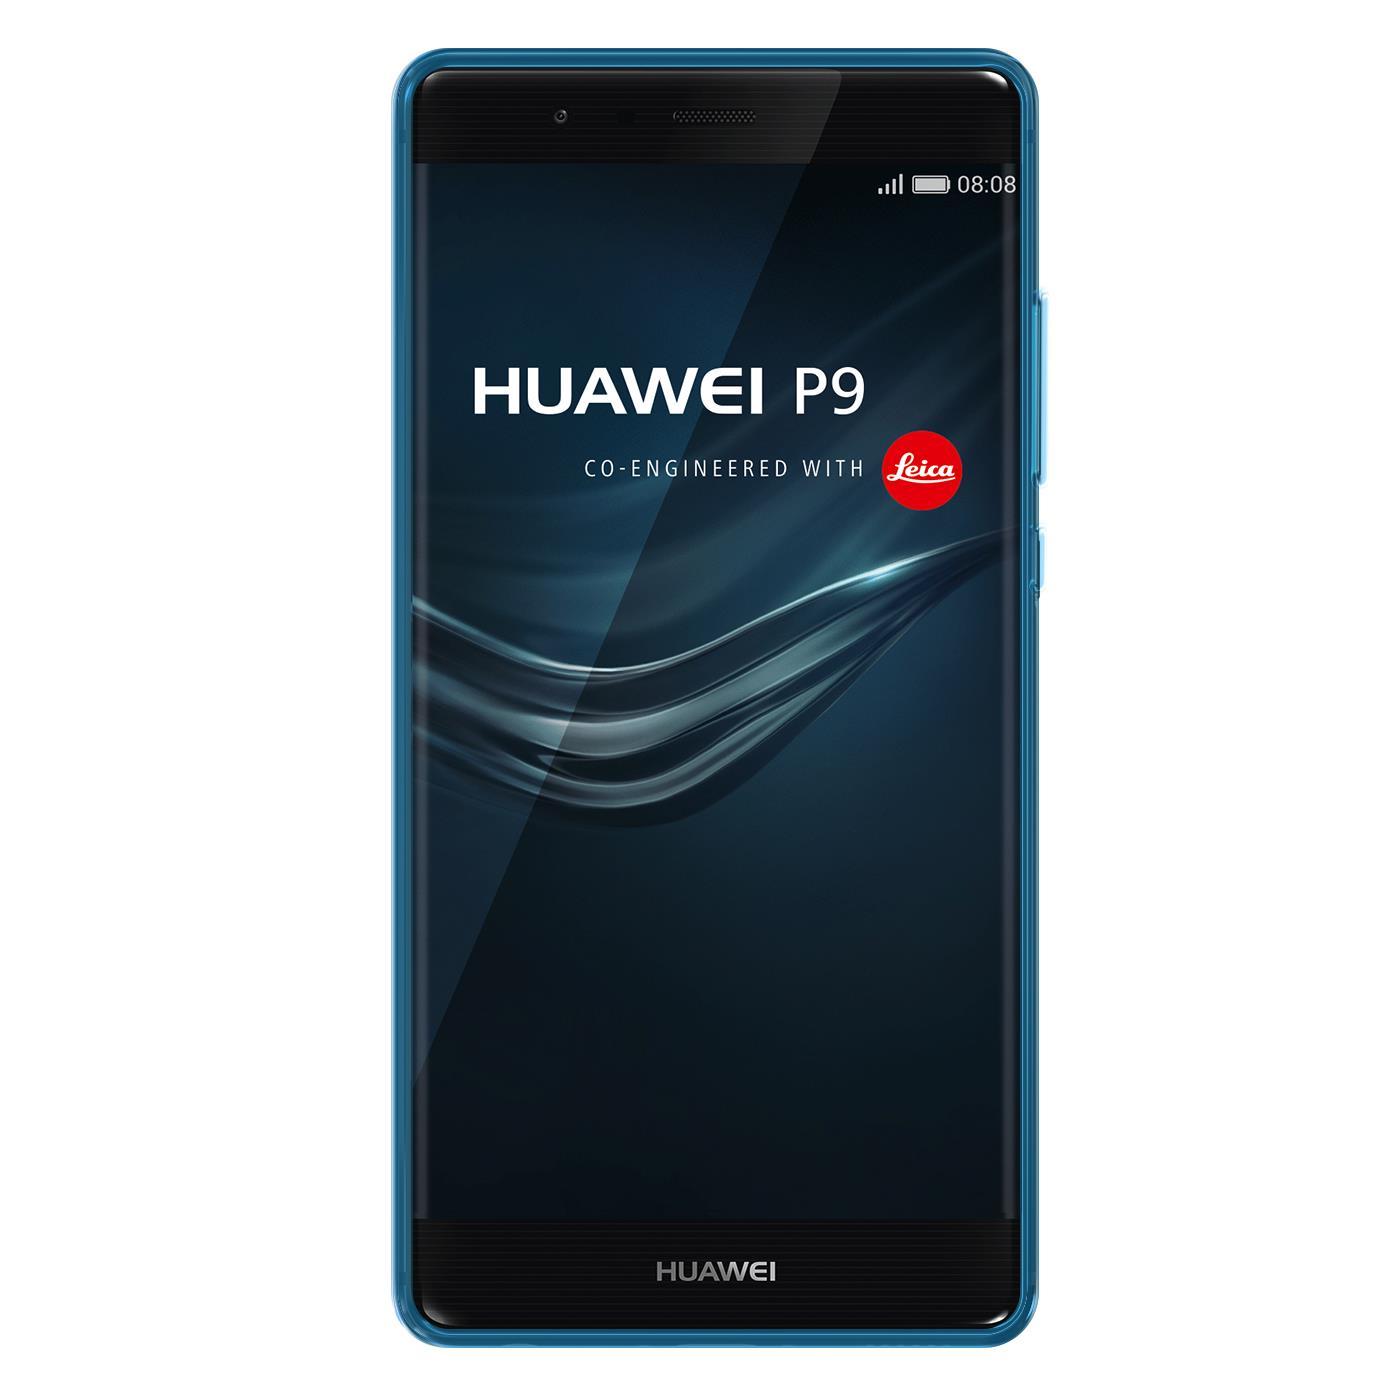 Huawei-p9-Duenn-Silikon-Klar-Case-Cover-Ultra-Slim-Stossfeste-Gel-Rueckseite Indexbild 9